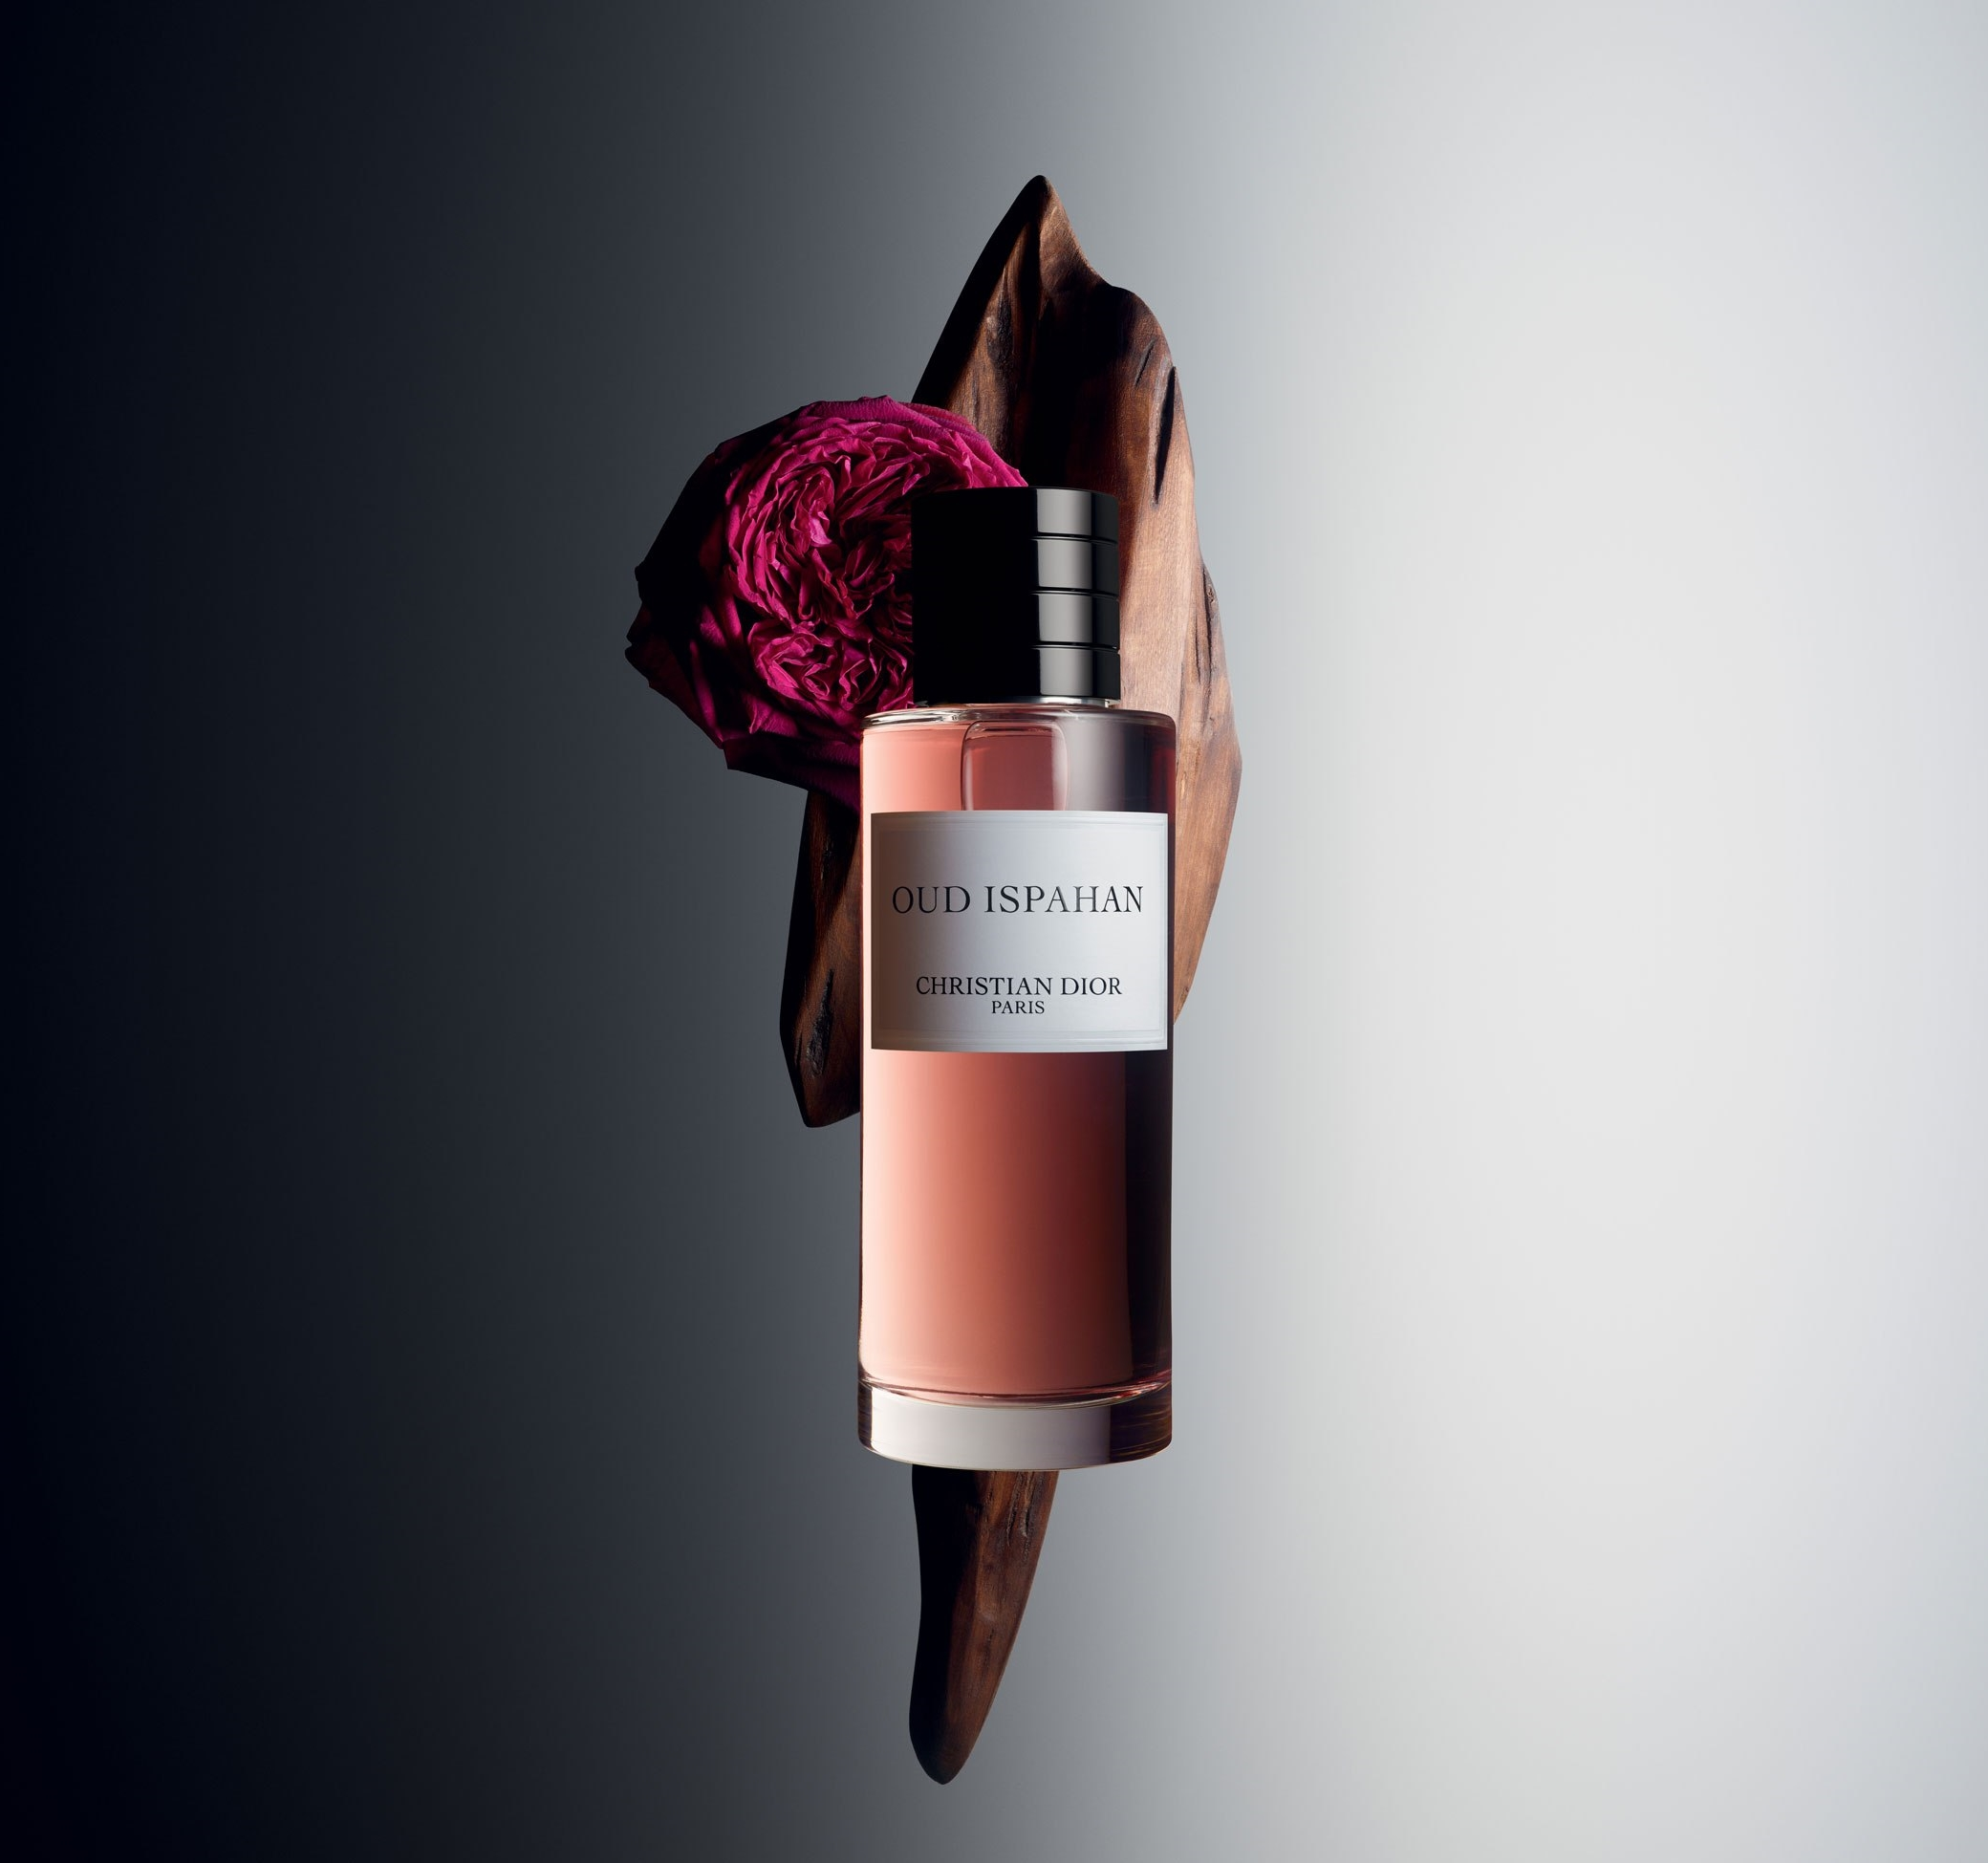 Gris Montaigne Christian Dior christian dior oud ispahan – yakymour